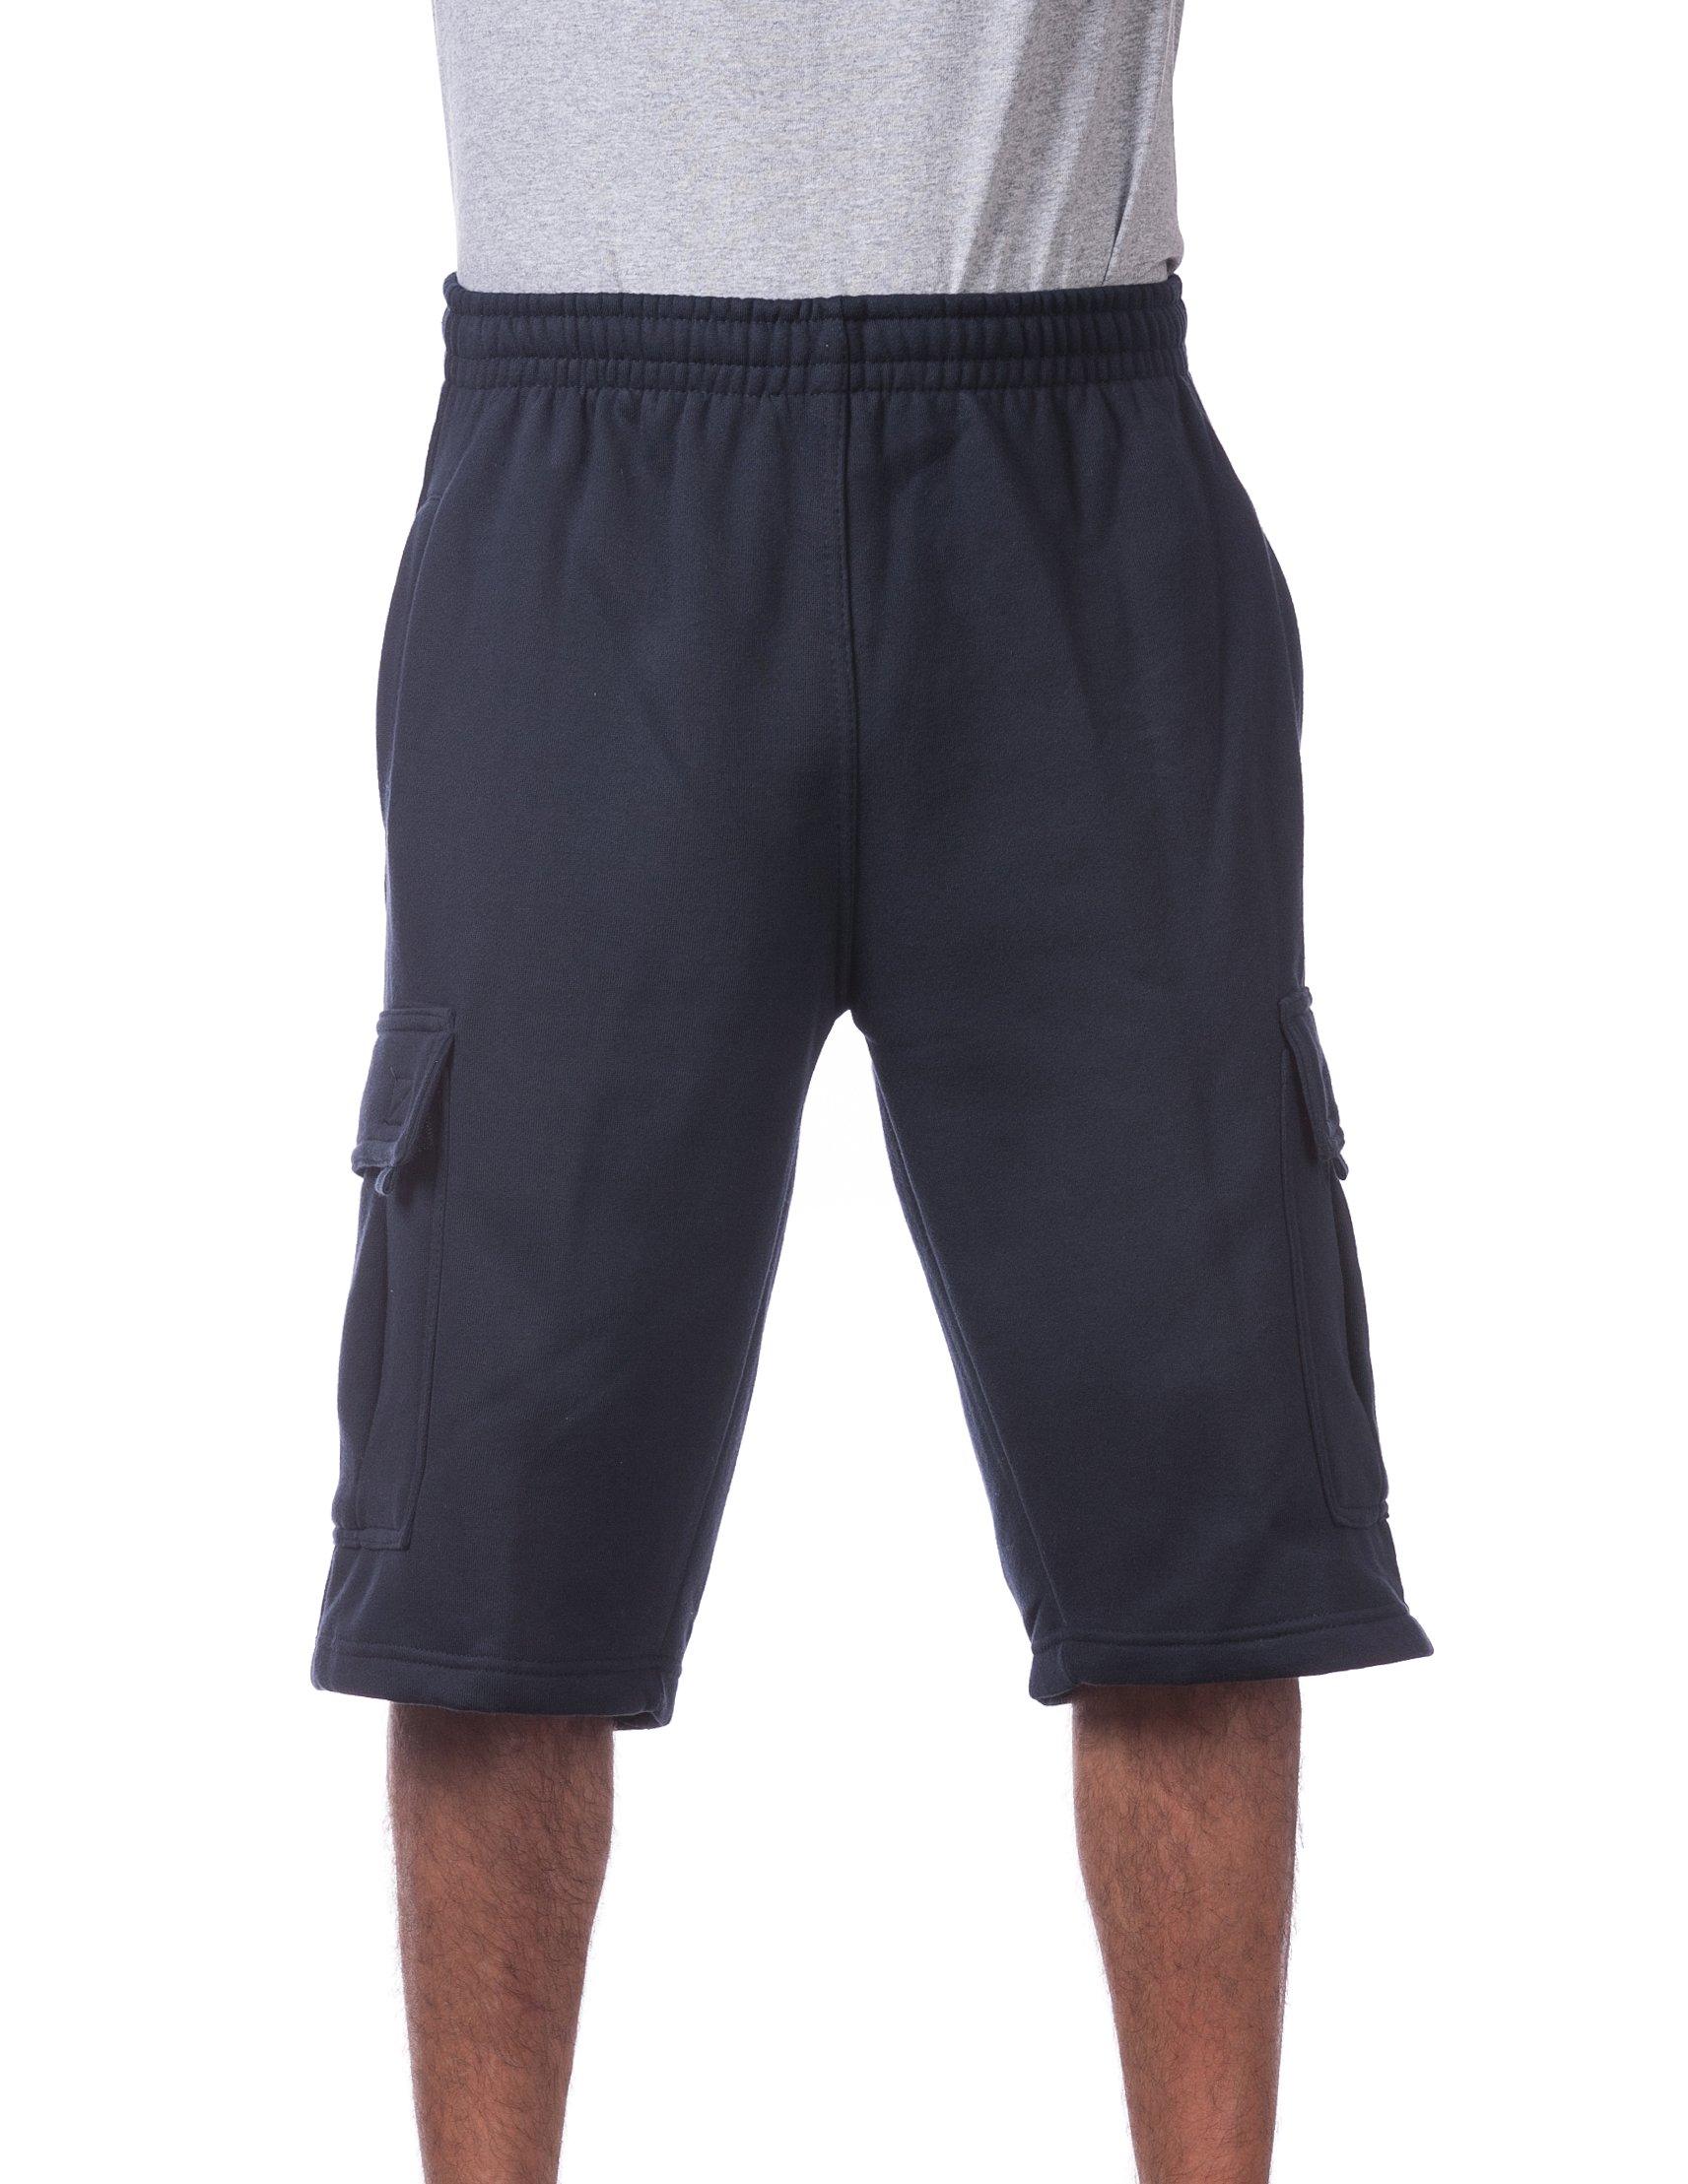 Pro Club Men's Fleece Cargo Short, Navy, 7X-Large